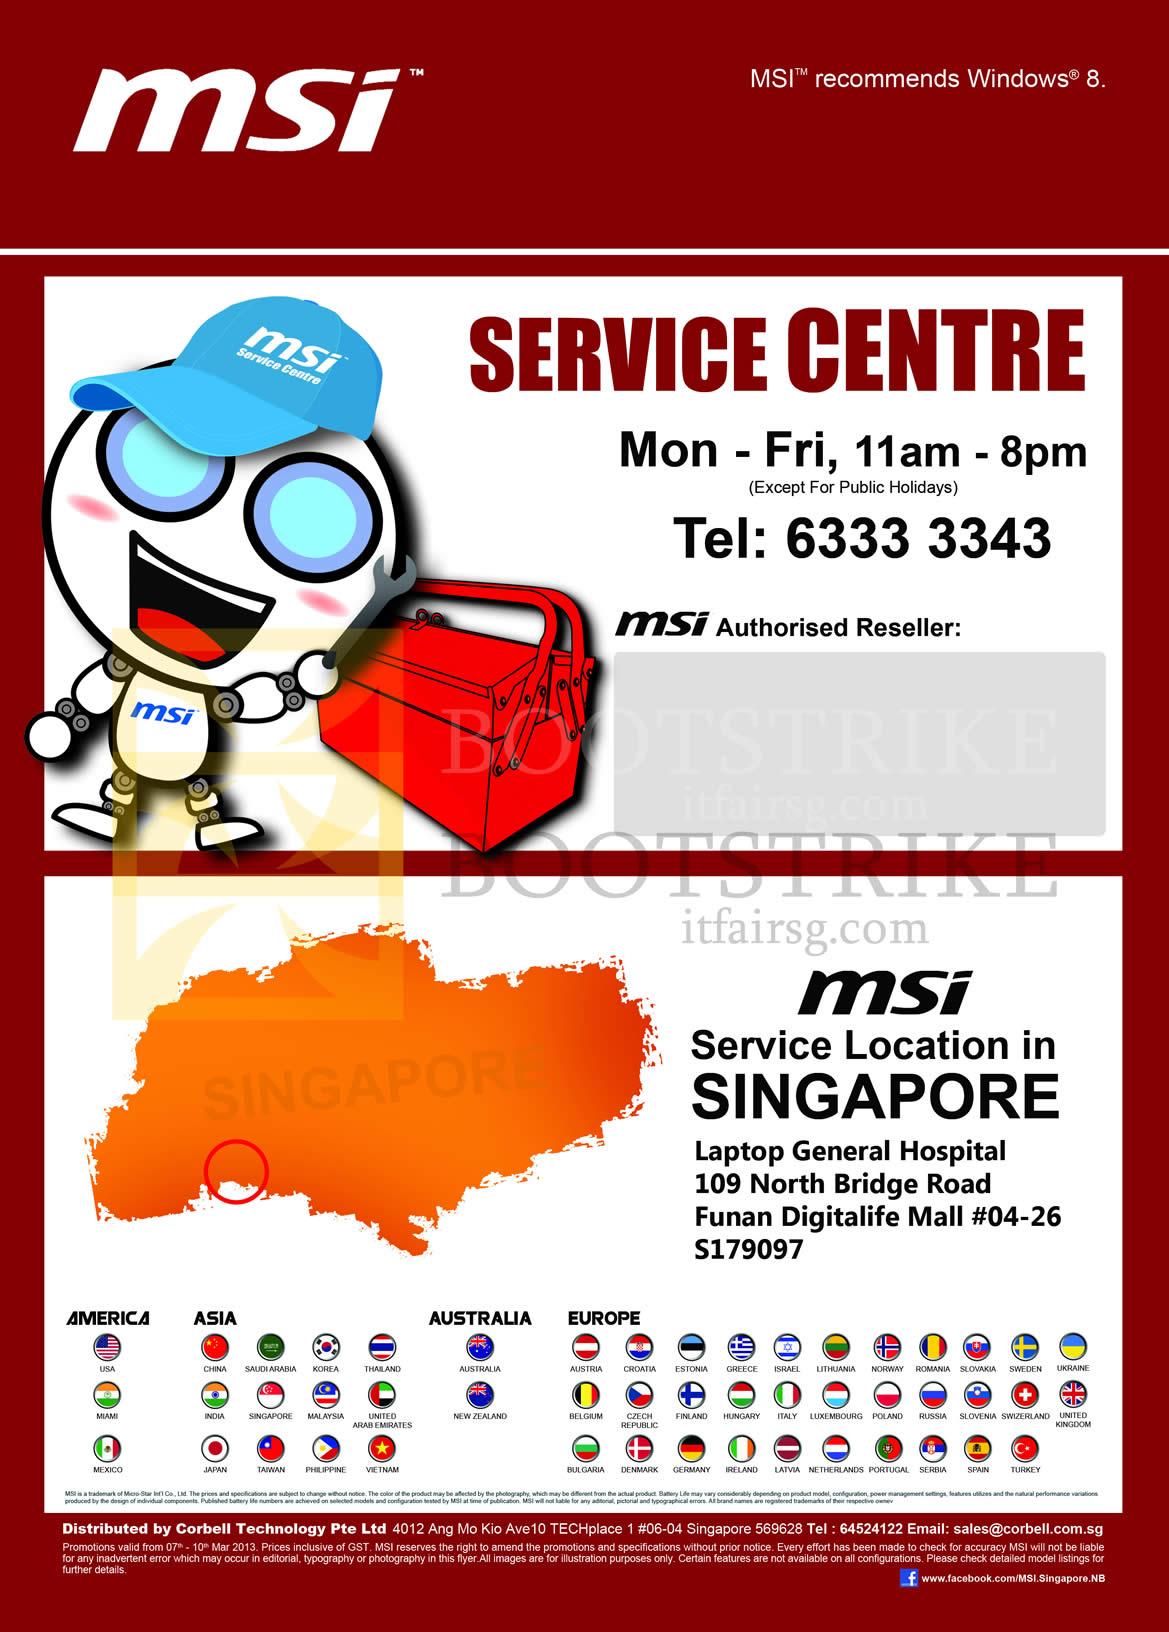 IT SHOW 2013 price list image brochure of Newstead MSI Service Centre Address